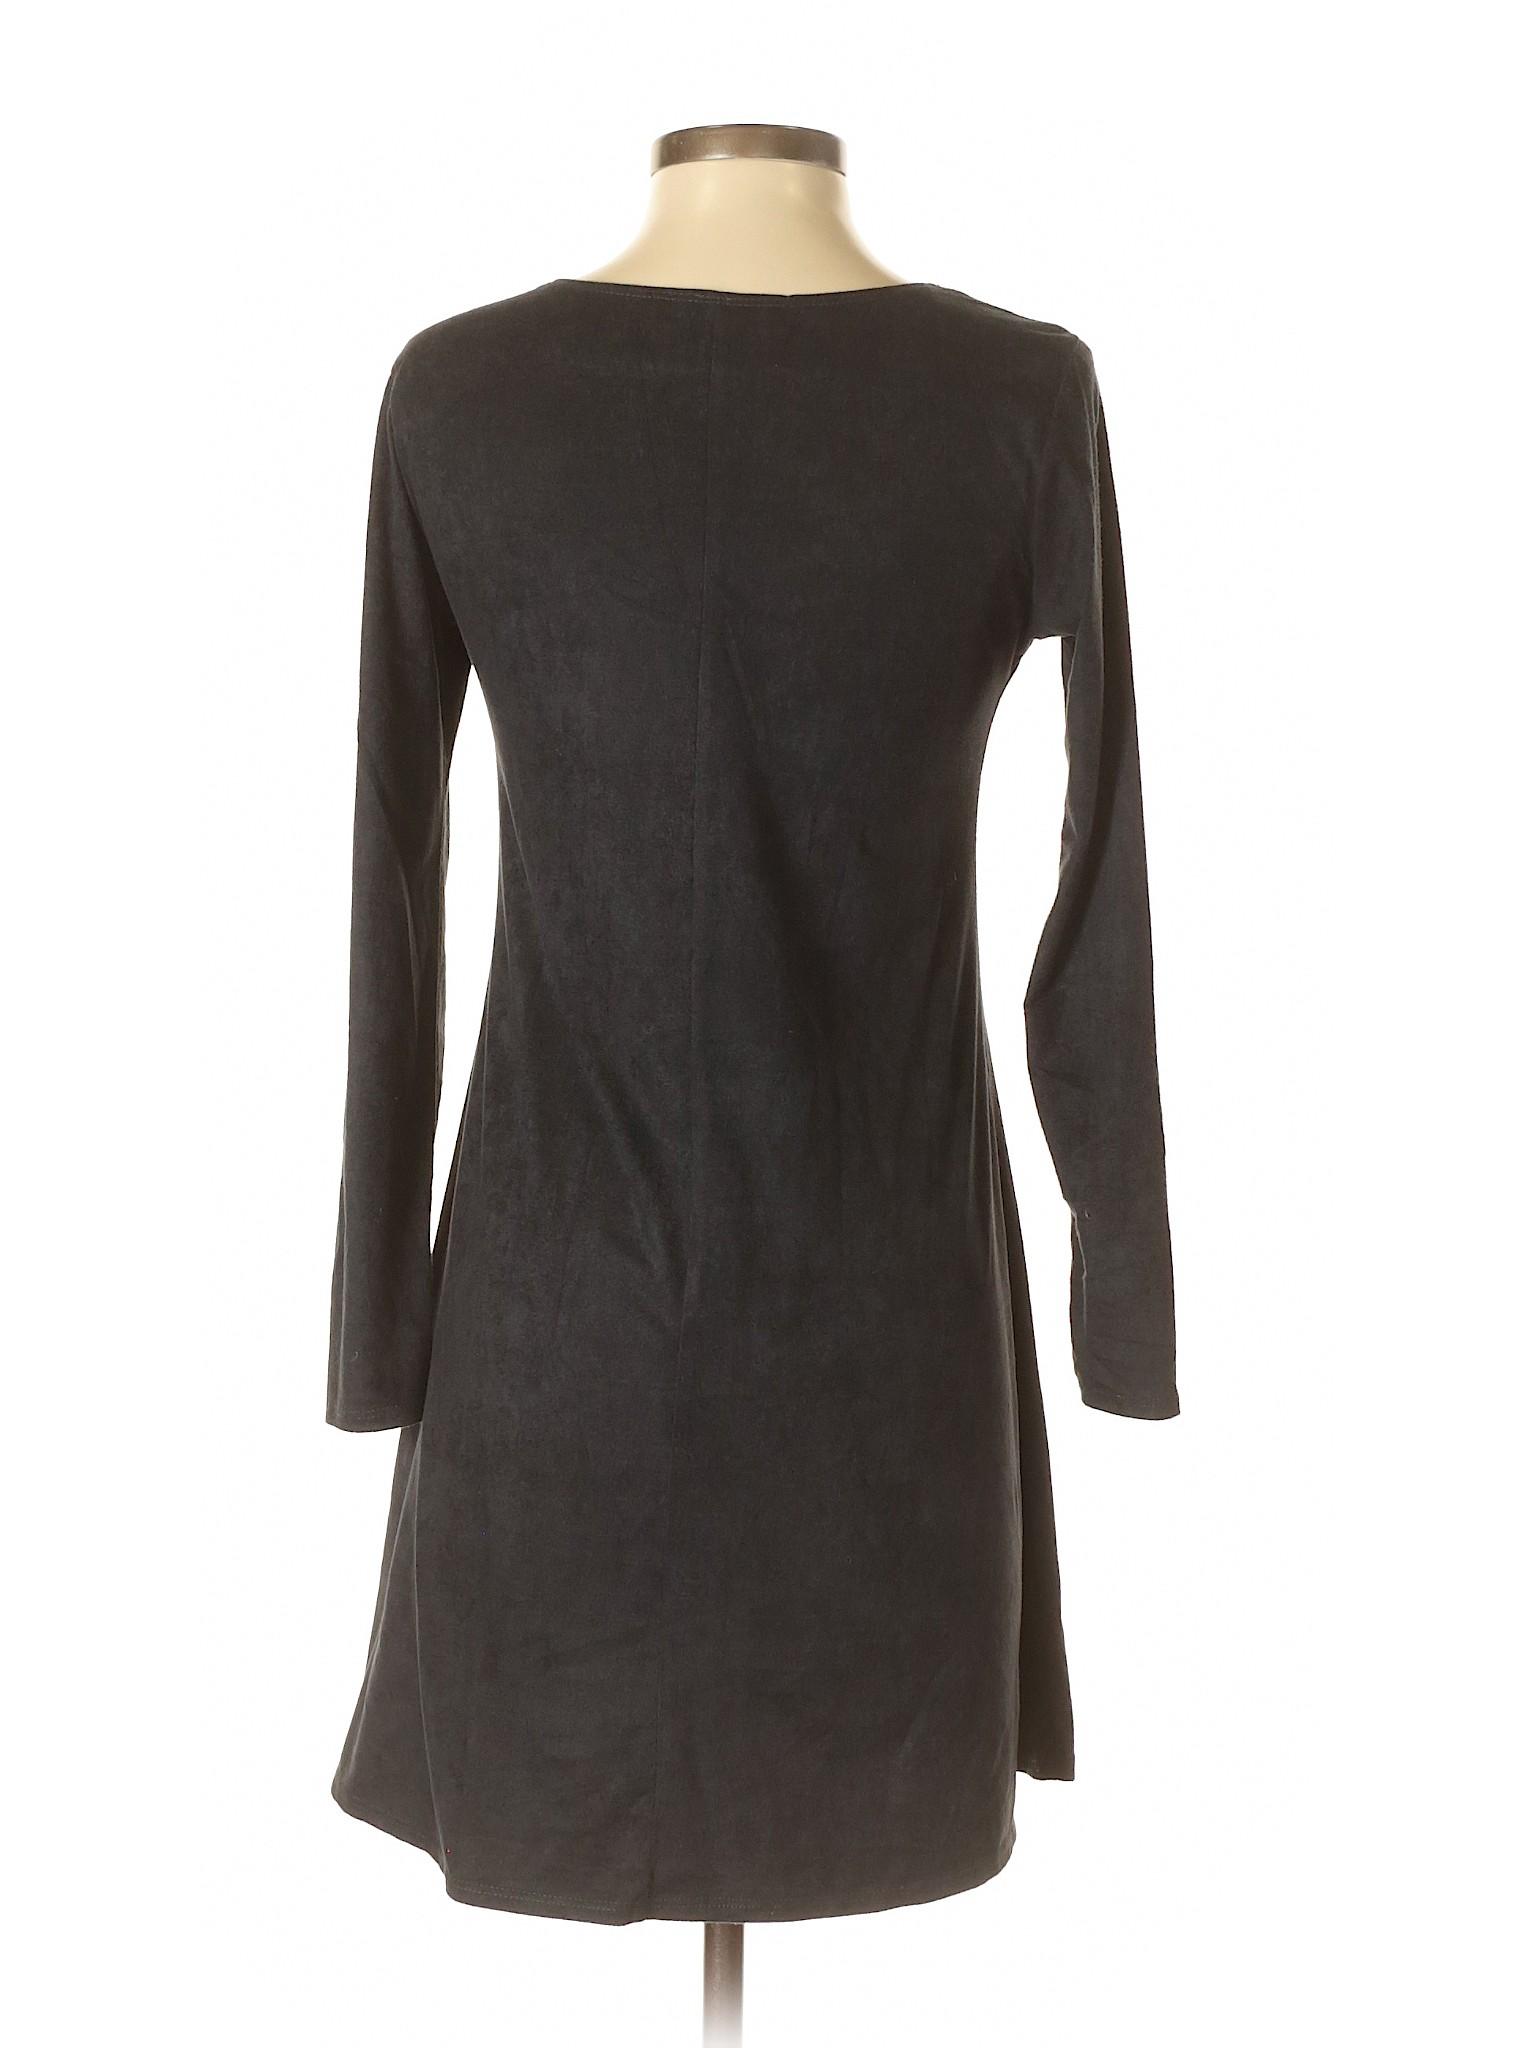 Boutique Fab'rik Dress Winter Casual Winter Boutique 6Uwnq1xn4